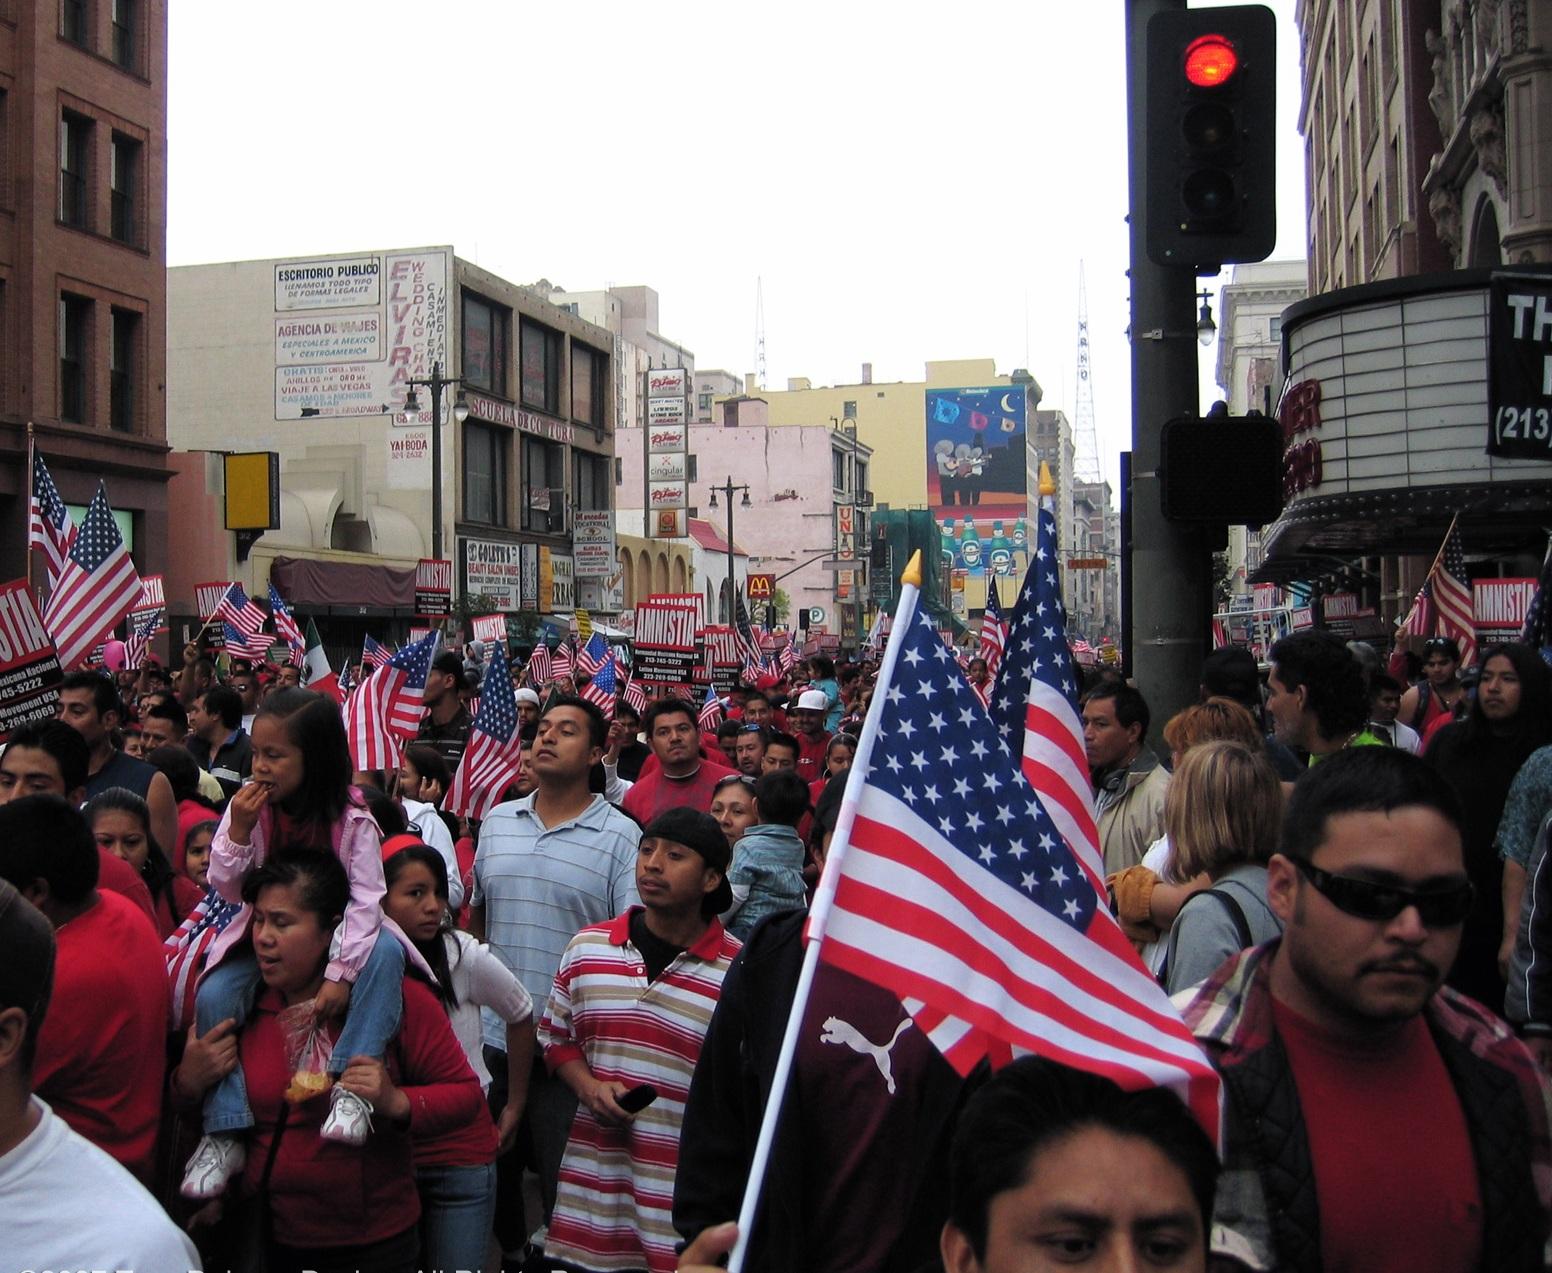 http://4.bp.blogspot.com/_1CM8MIpSPNo/S_7QyQNmtaI/AAAAAAAABng/9StXbZ1MGNY/s1600/proimmigration.jpg